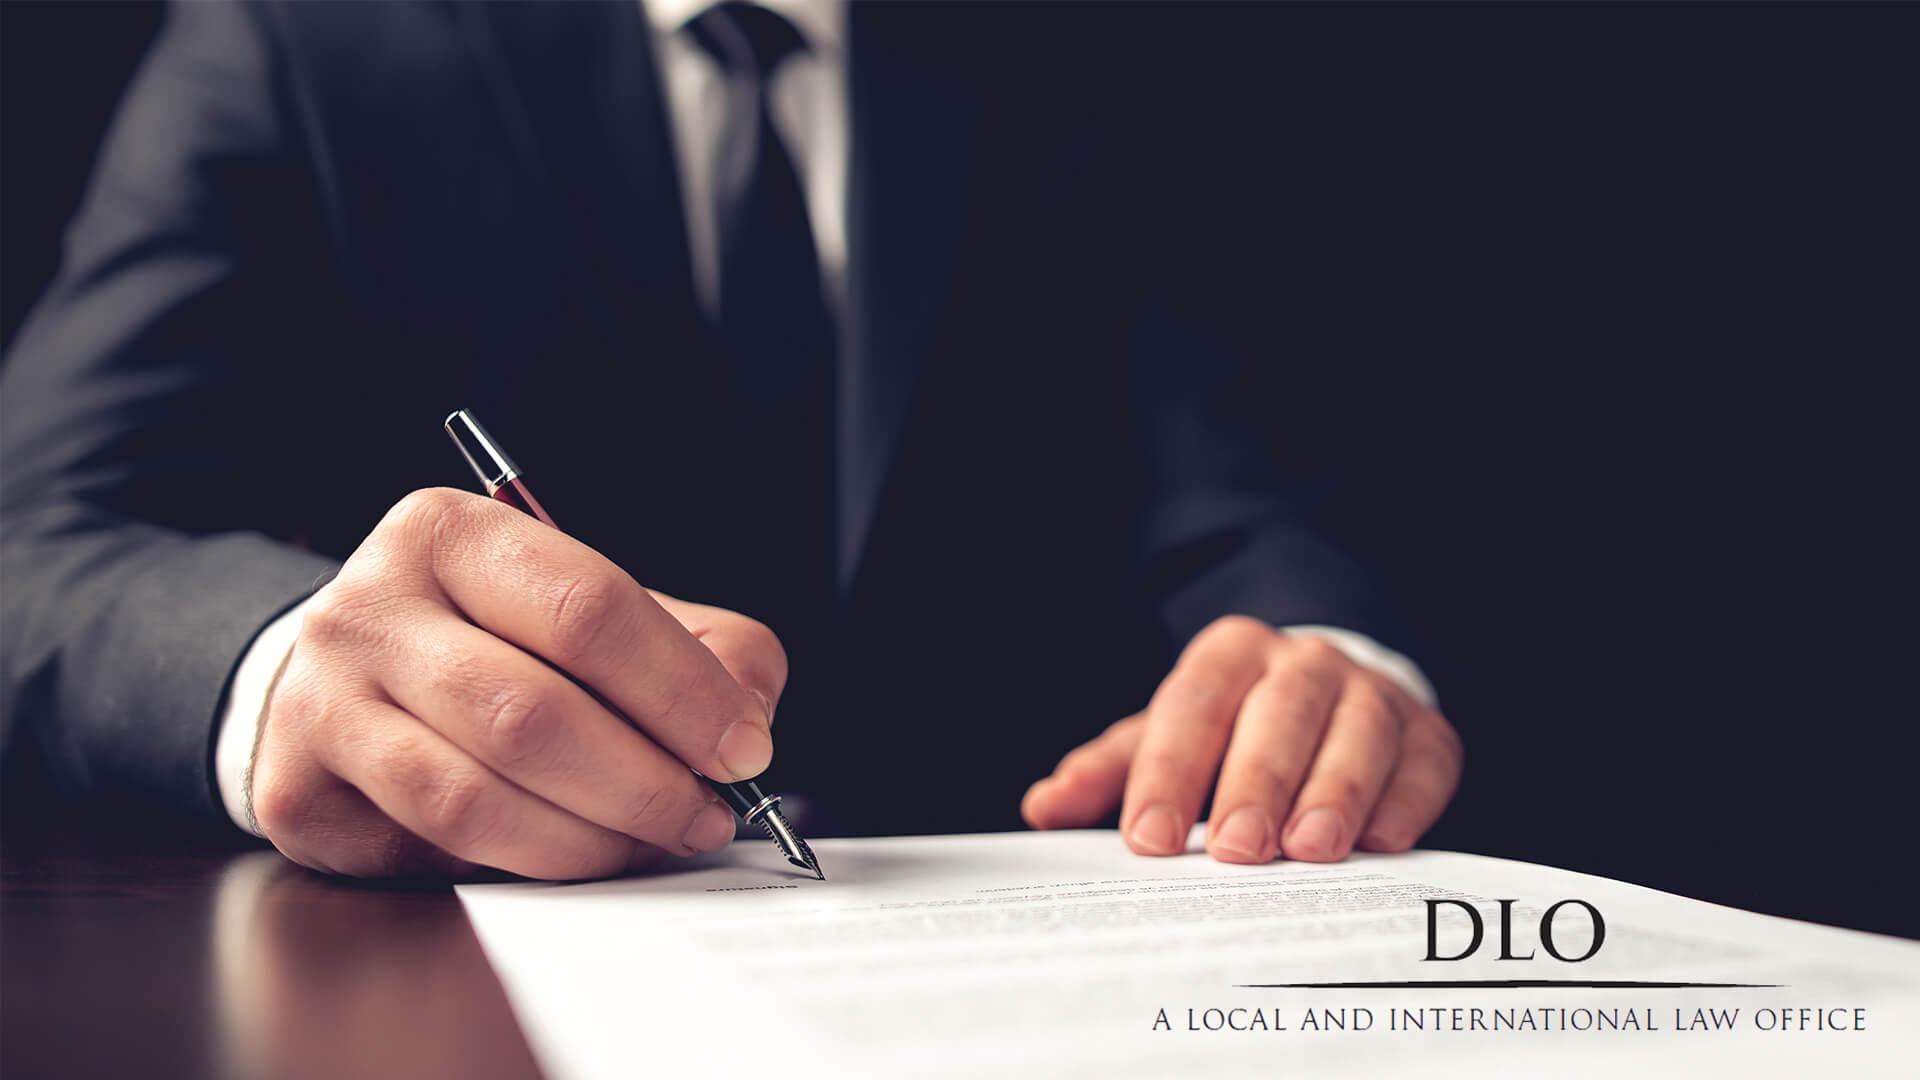 Dler Law Office